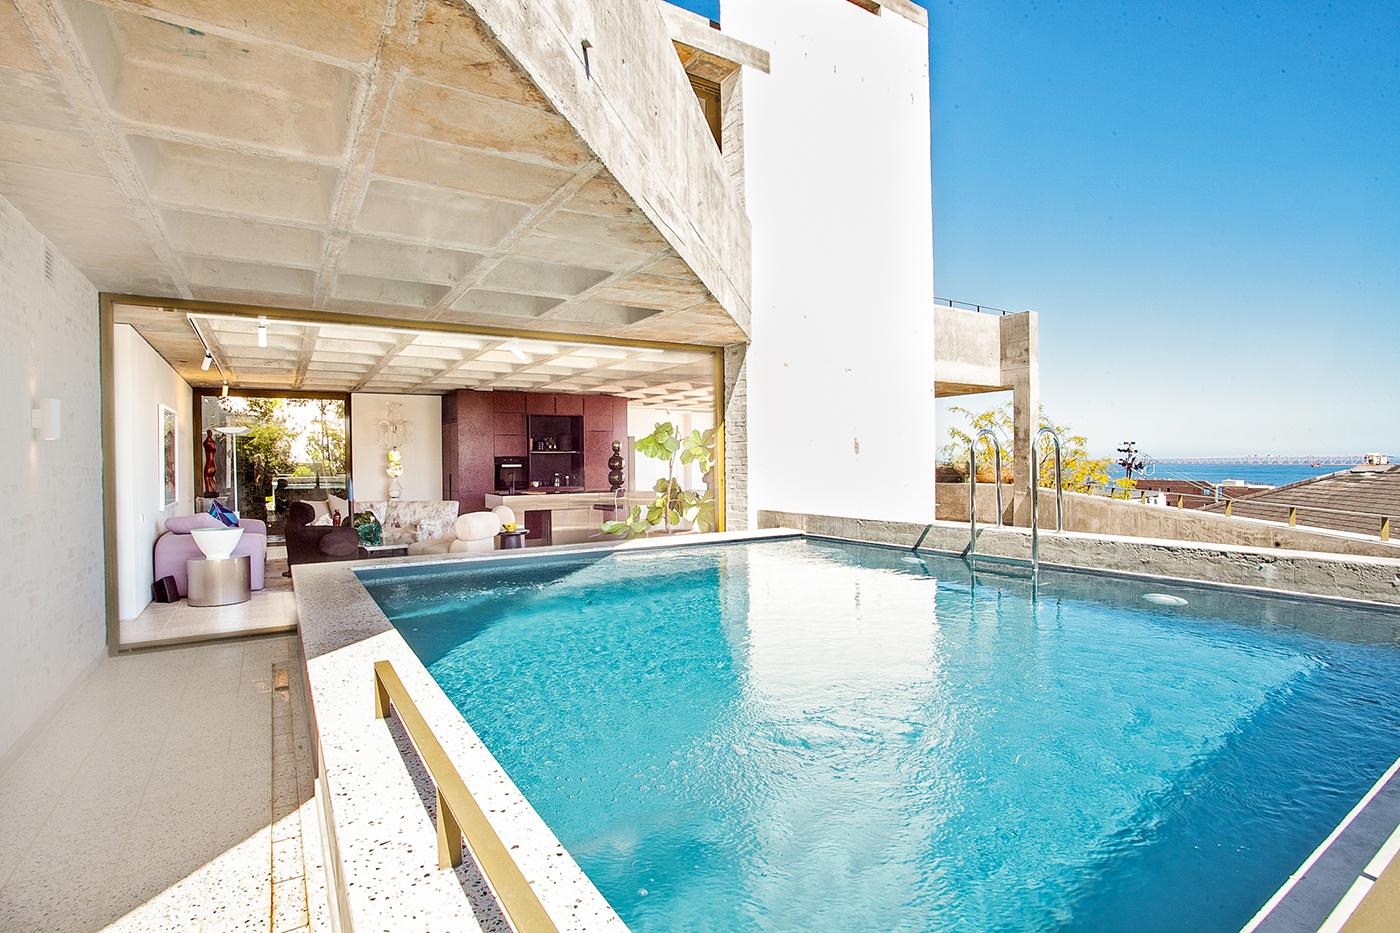 3 Bedroom, Ground Floor Apartment in Sea Point – VAT Included